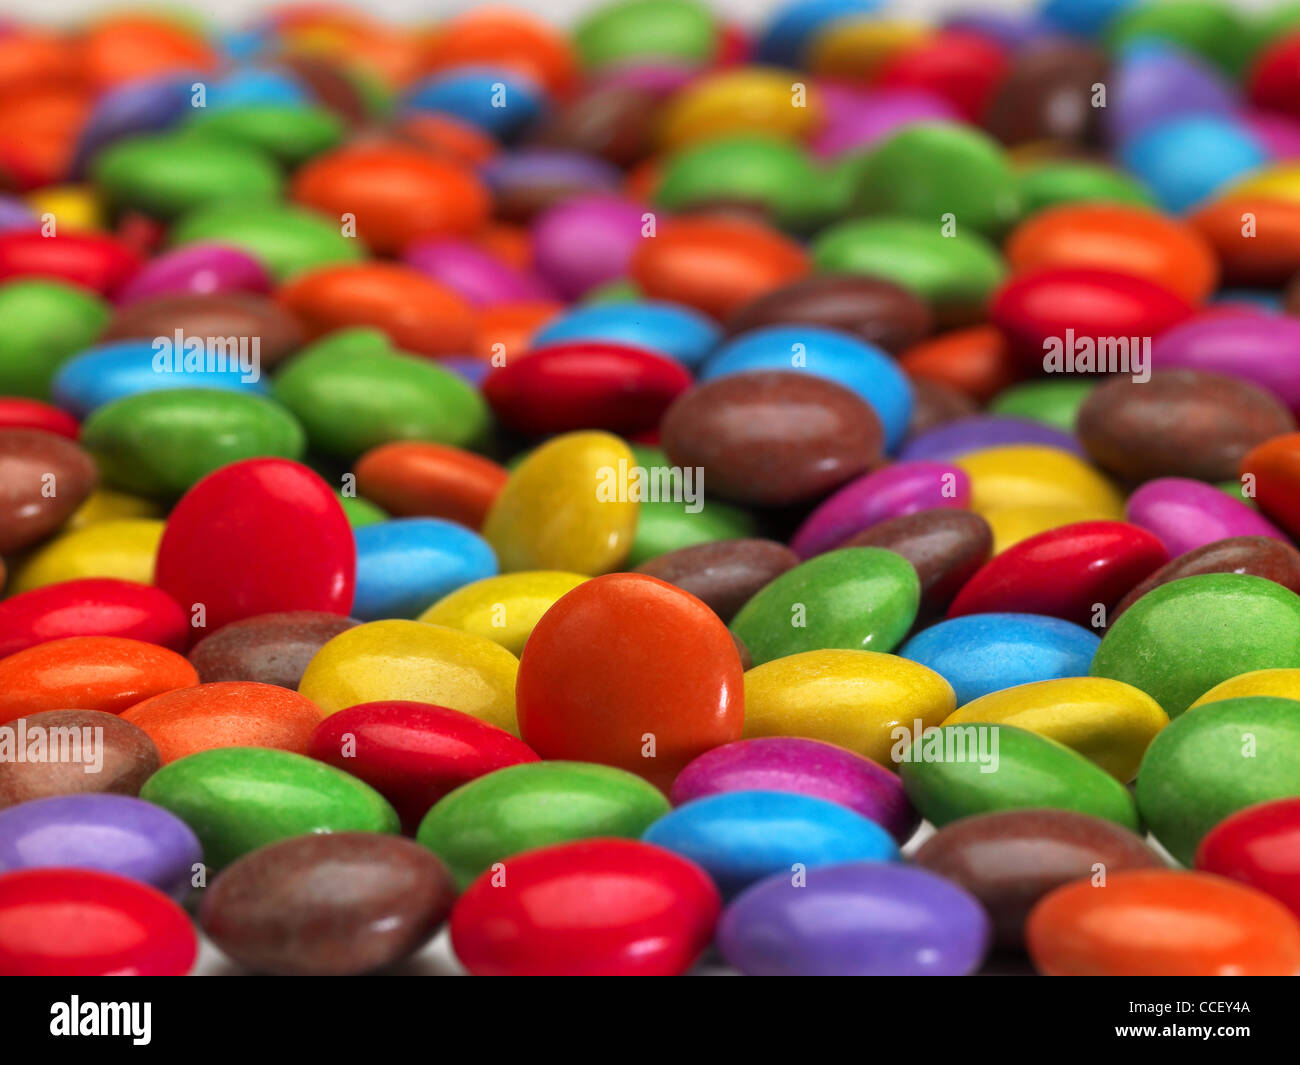 Smarties sweets - Stock Image